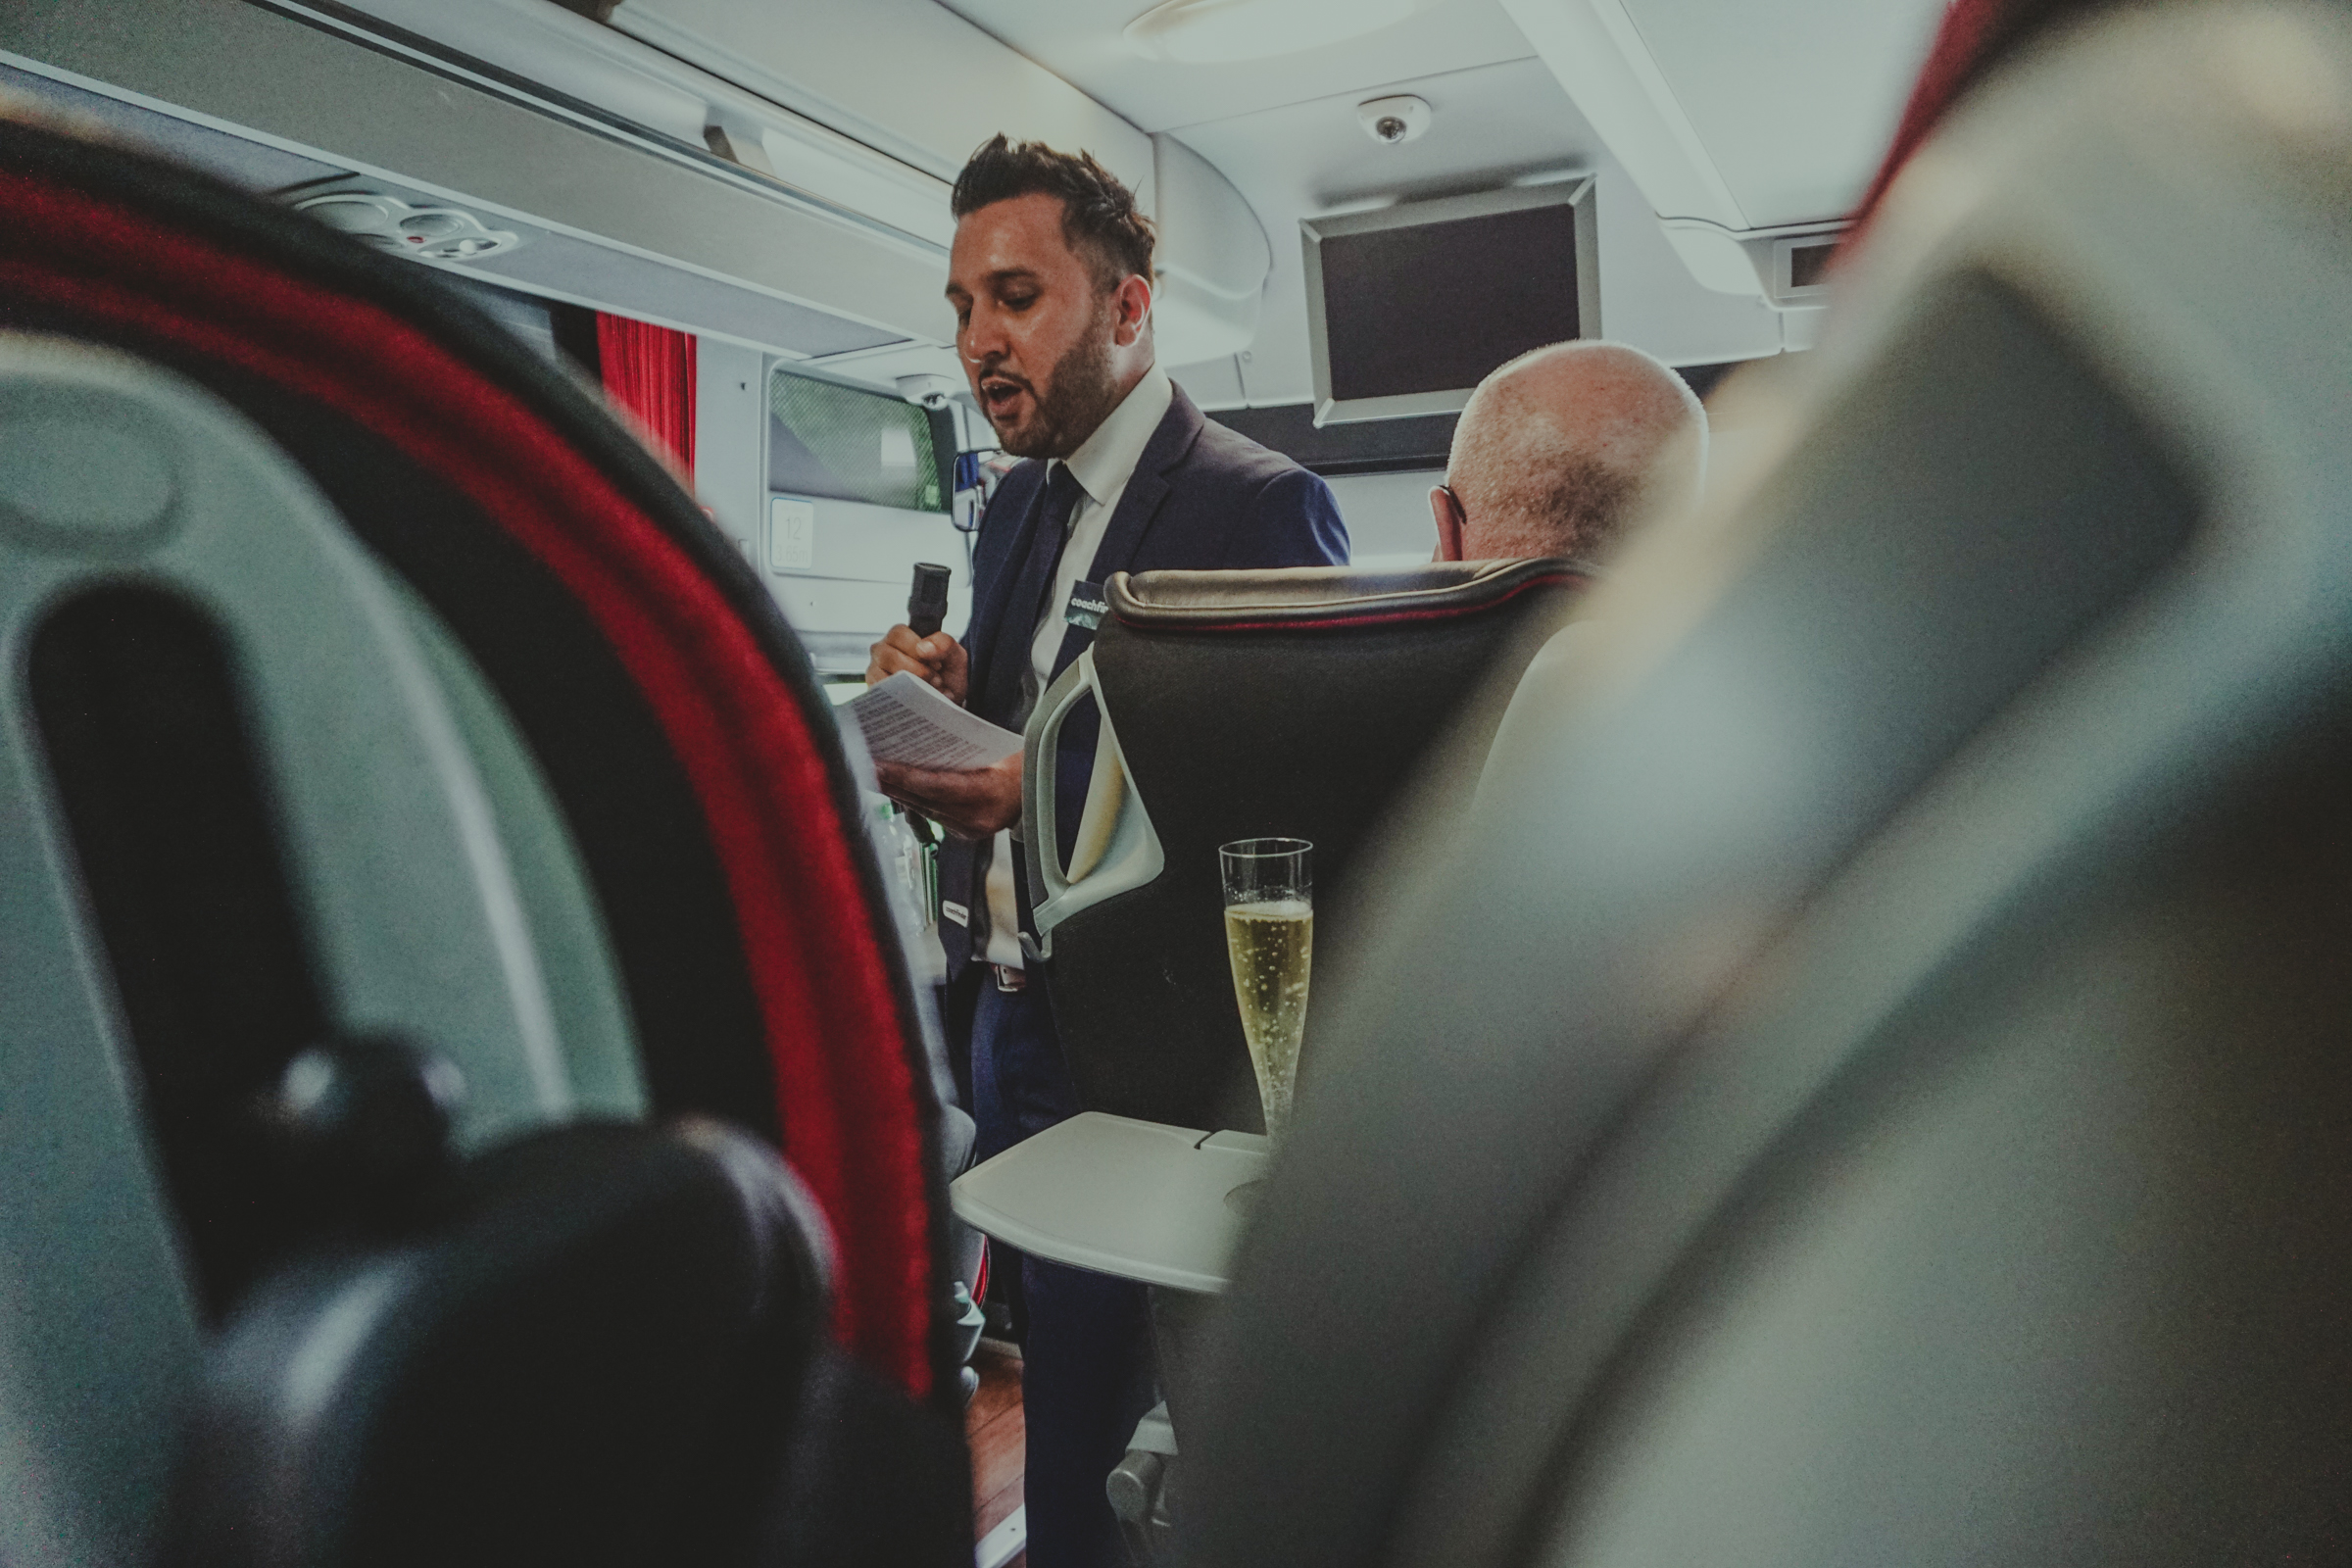 book-a-coach-coachfinder-group-travel-london-uk5.jpg